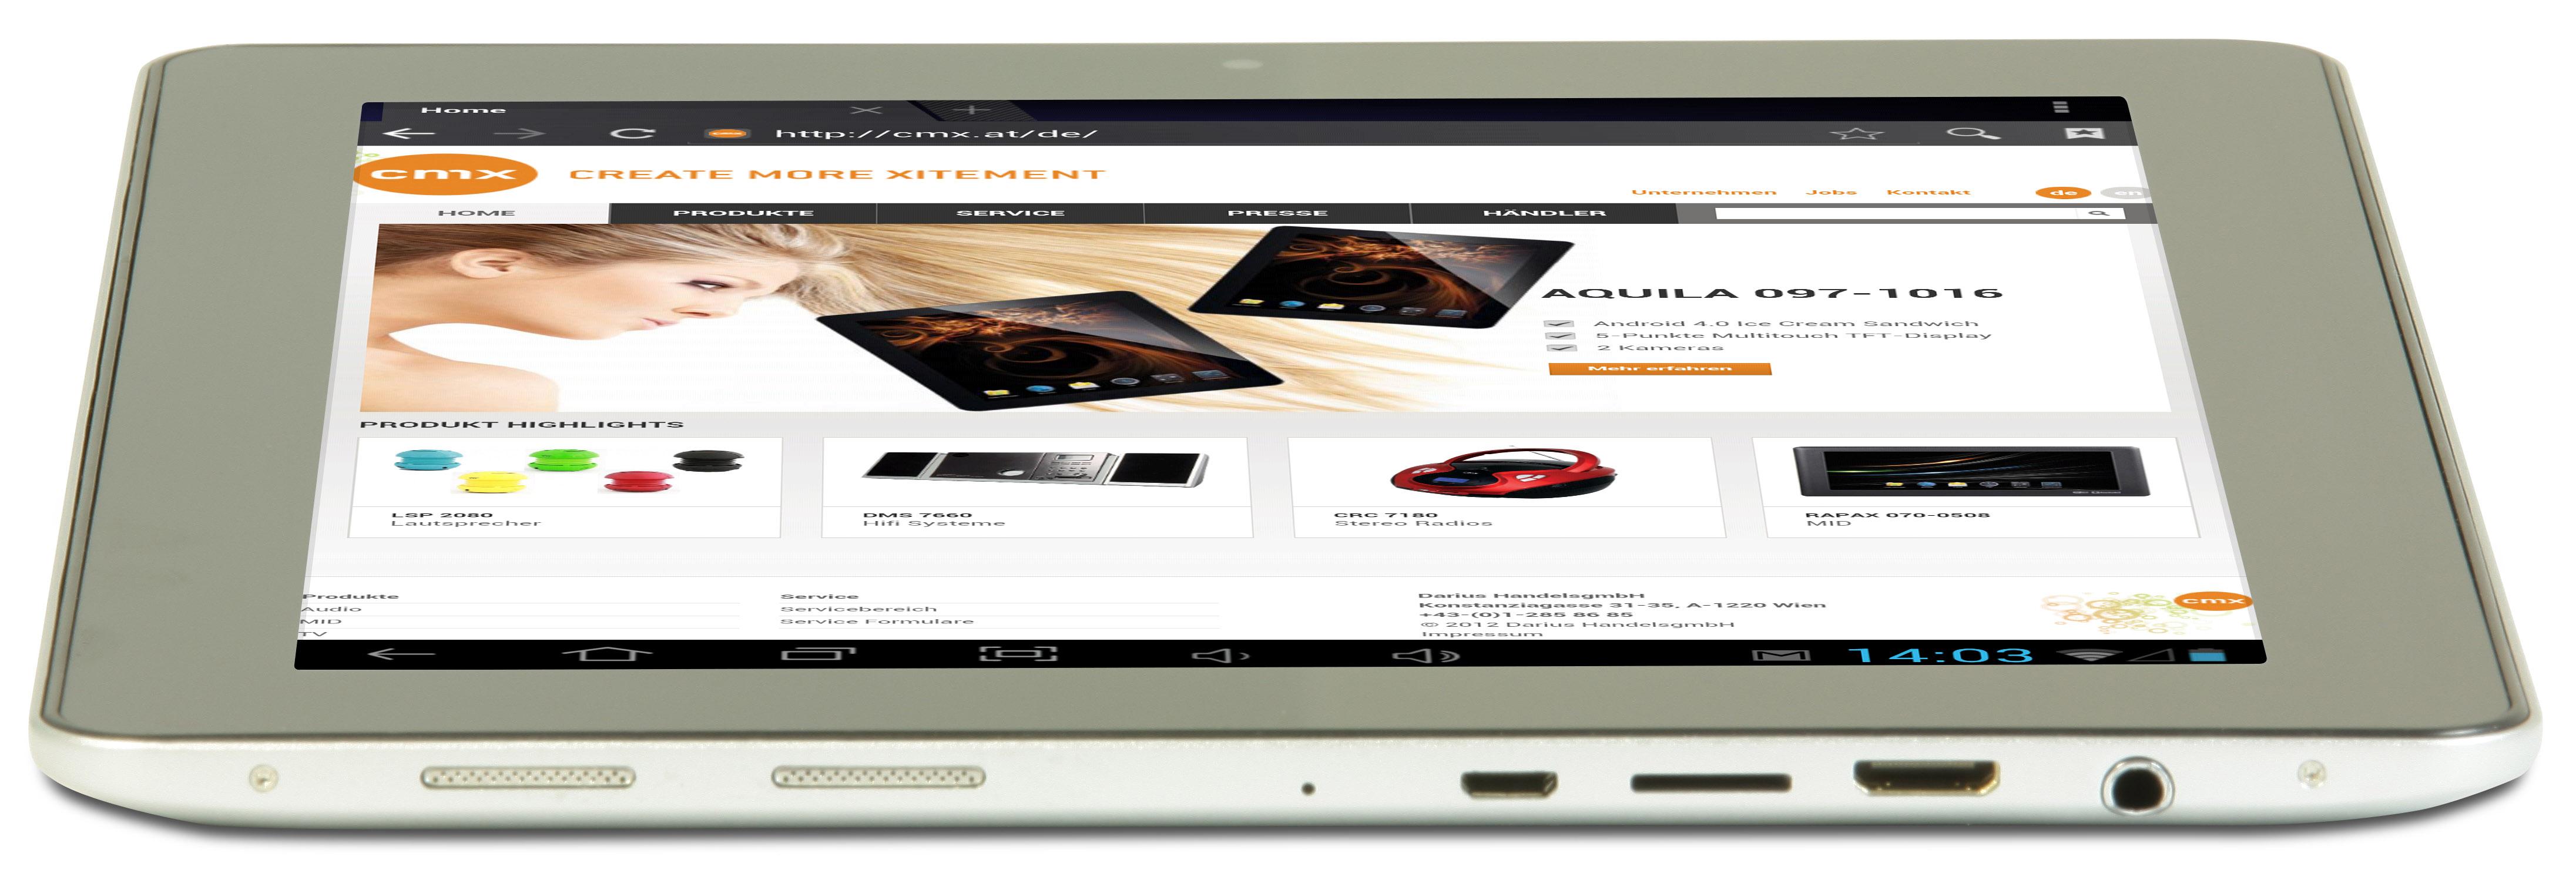 cmx Clanga 097 angekündigt – Quad-Core A31, Retina-Display & Android 4.1 – Weitere Variante des Onda V972